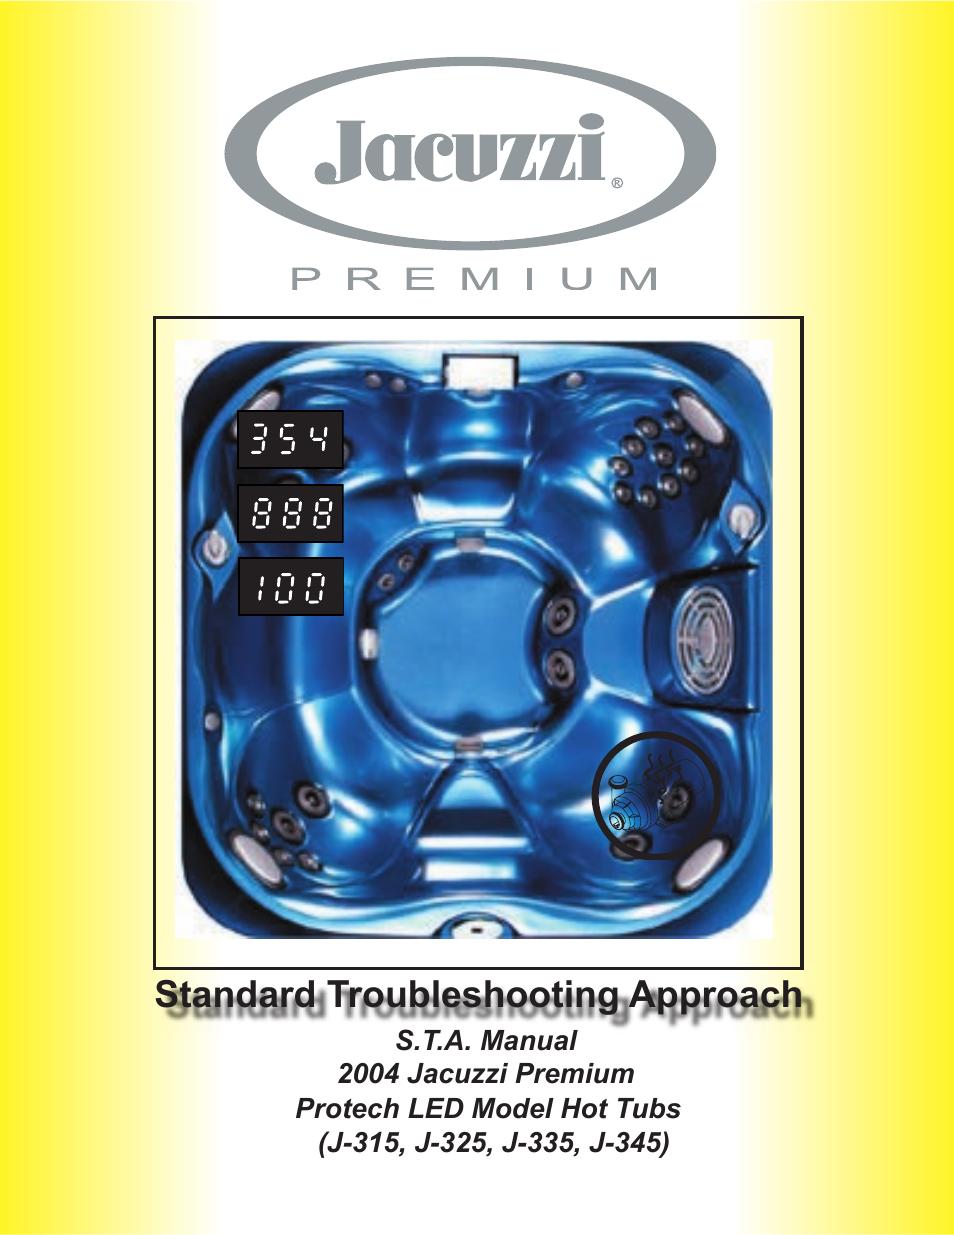 jacuzzi j315 user manual 62 pages also for j 345 rh manualsdir com Jacuzzi J 300 Series Jacuzzi J 315 Parts